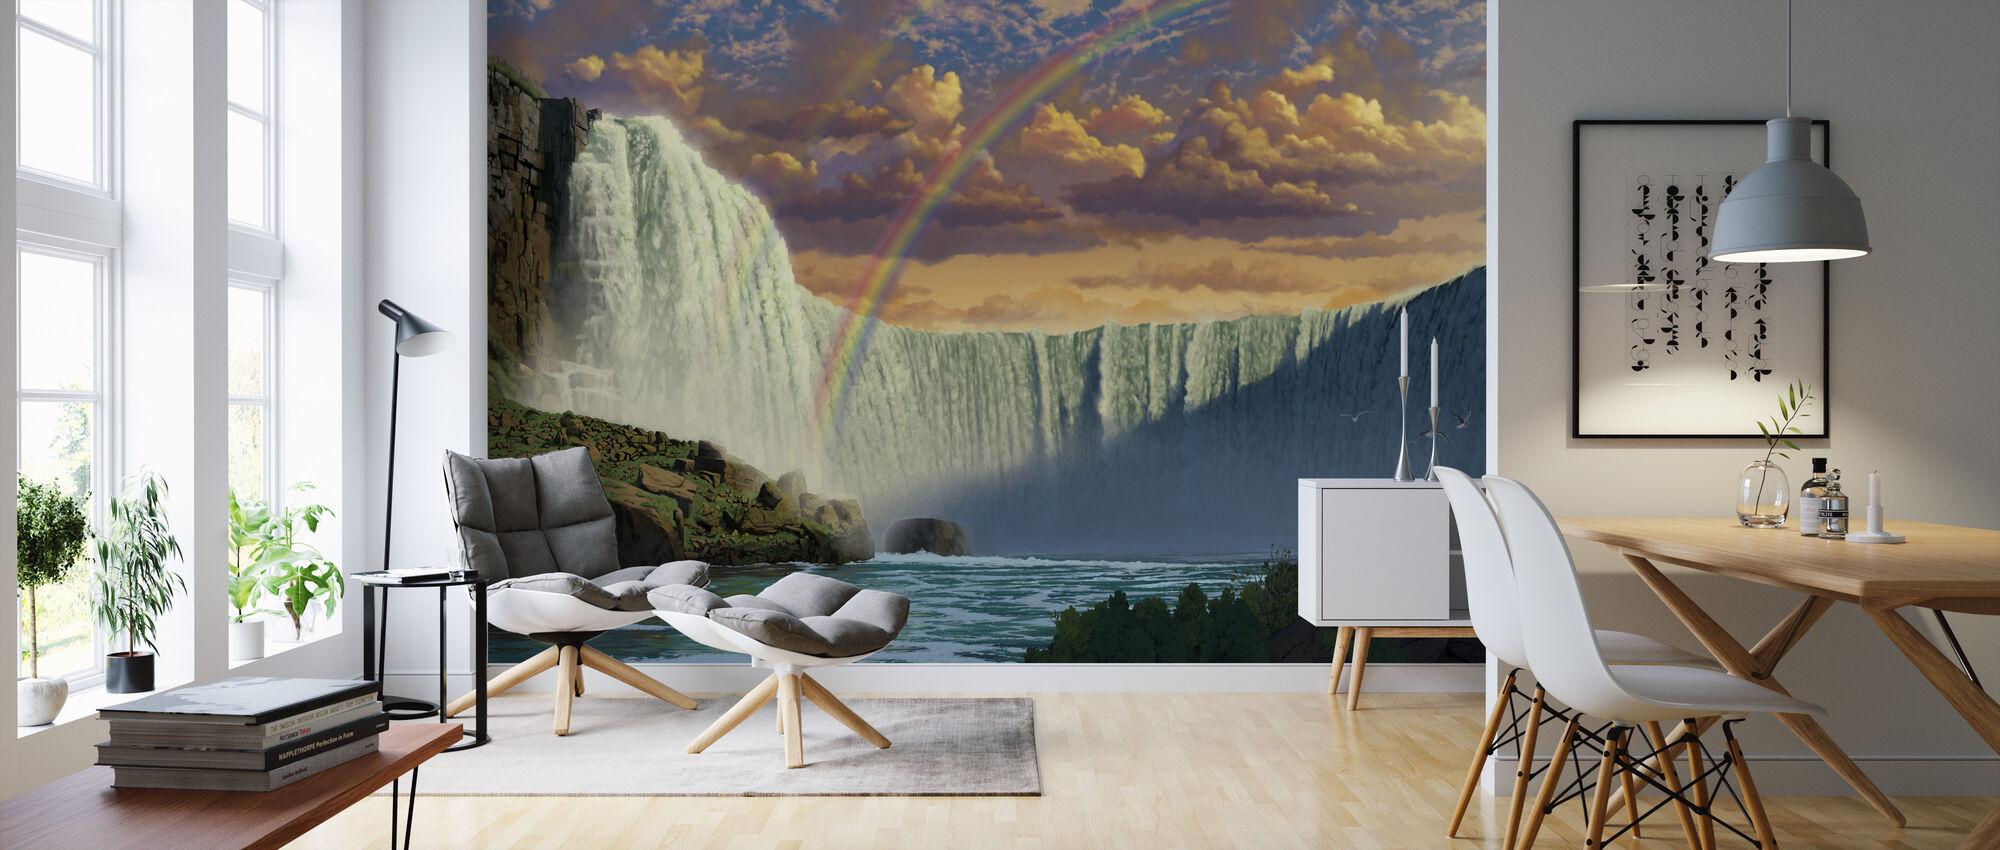 Niagarawatervallen - Behang - Woonkamer